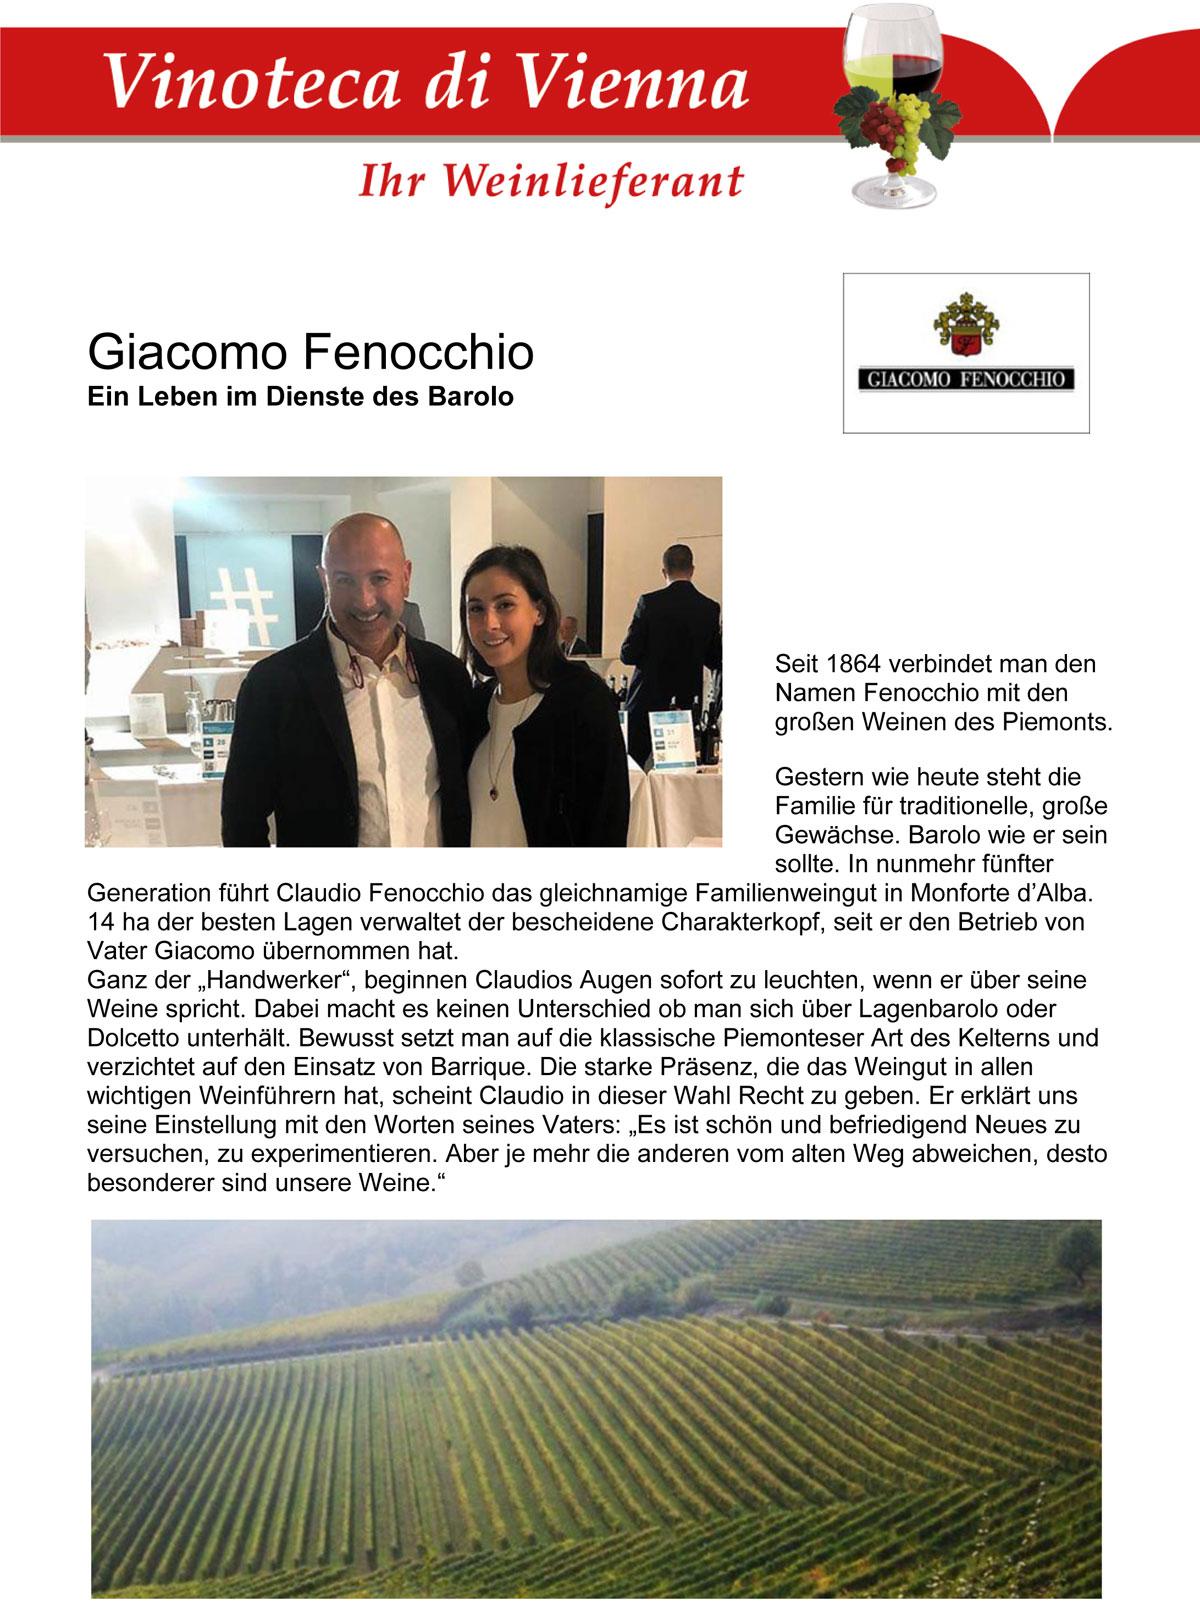 Giacomo Fenocchio, Italien, Piemont, Monforte d'Alba